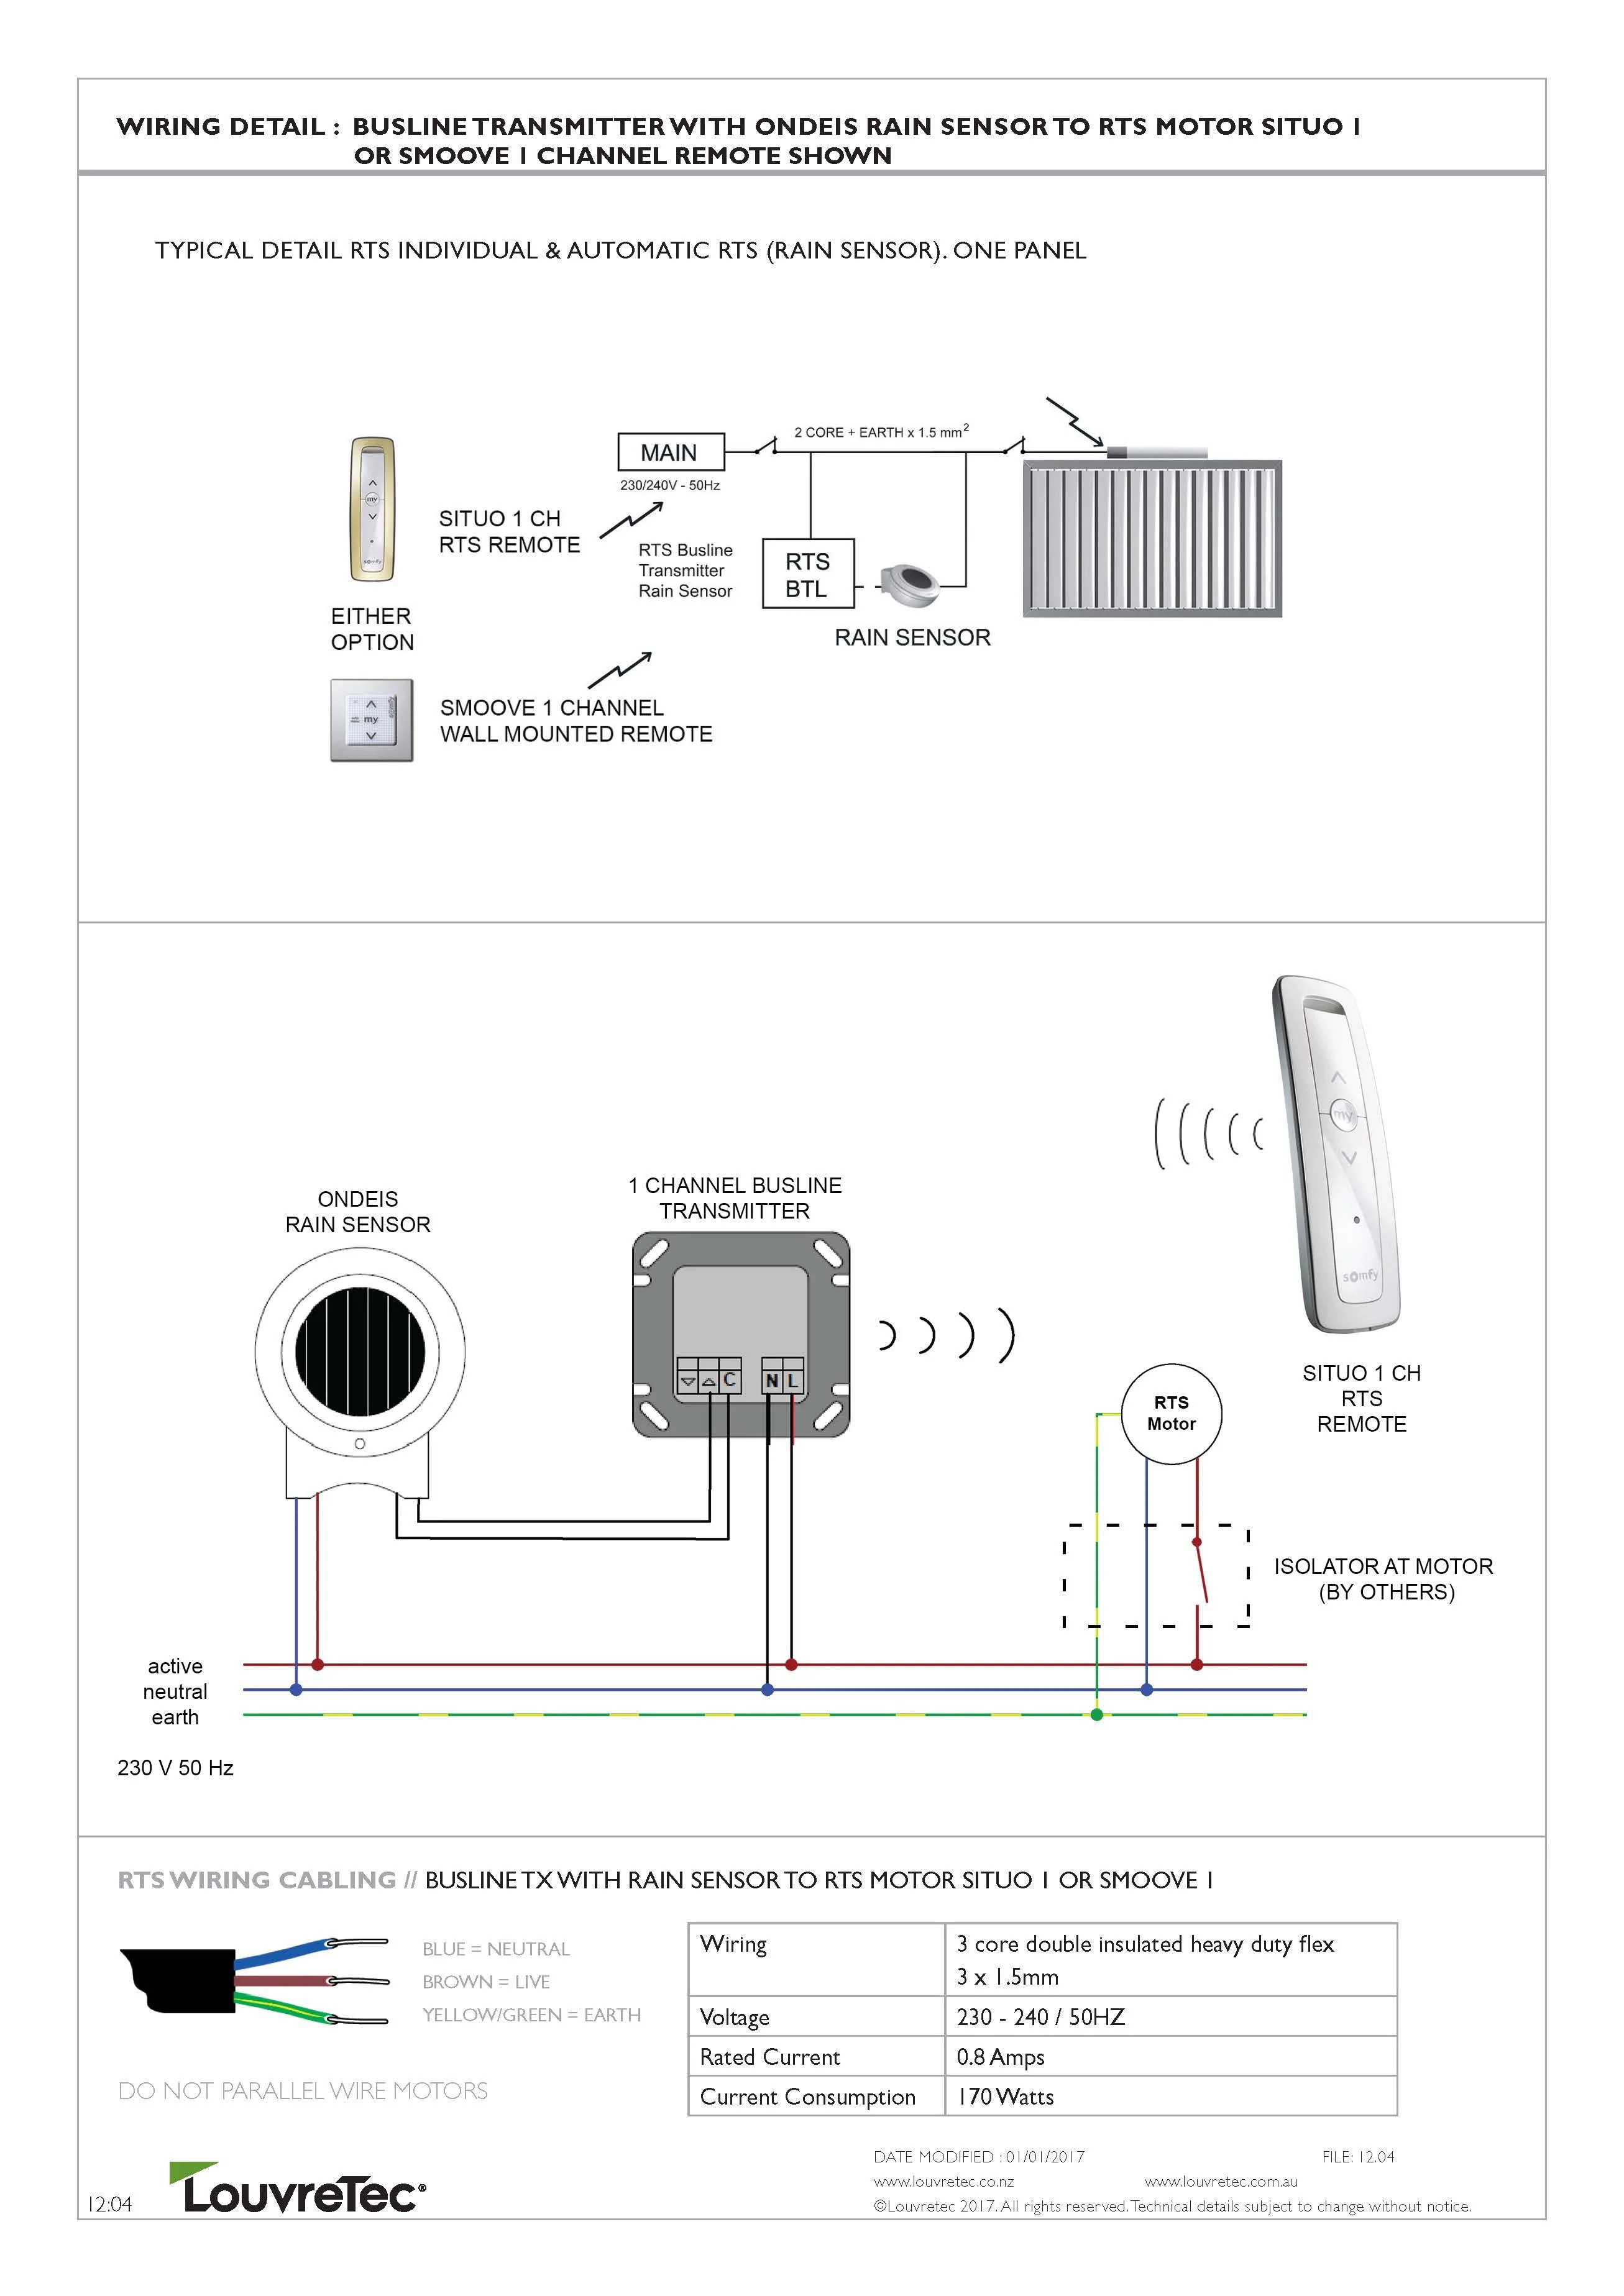 small resolution of rts individual auto rts 1 panel 12 04